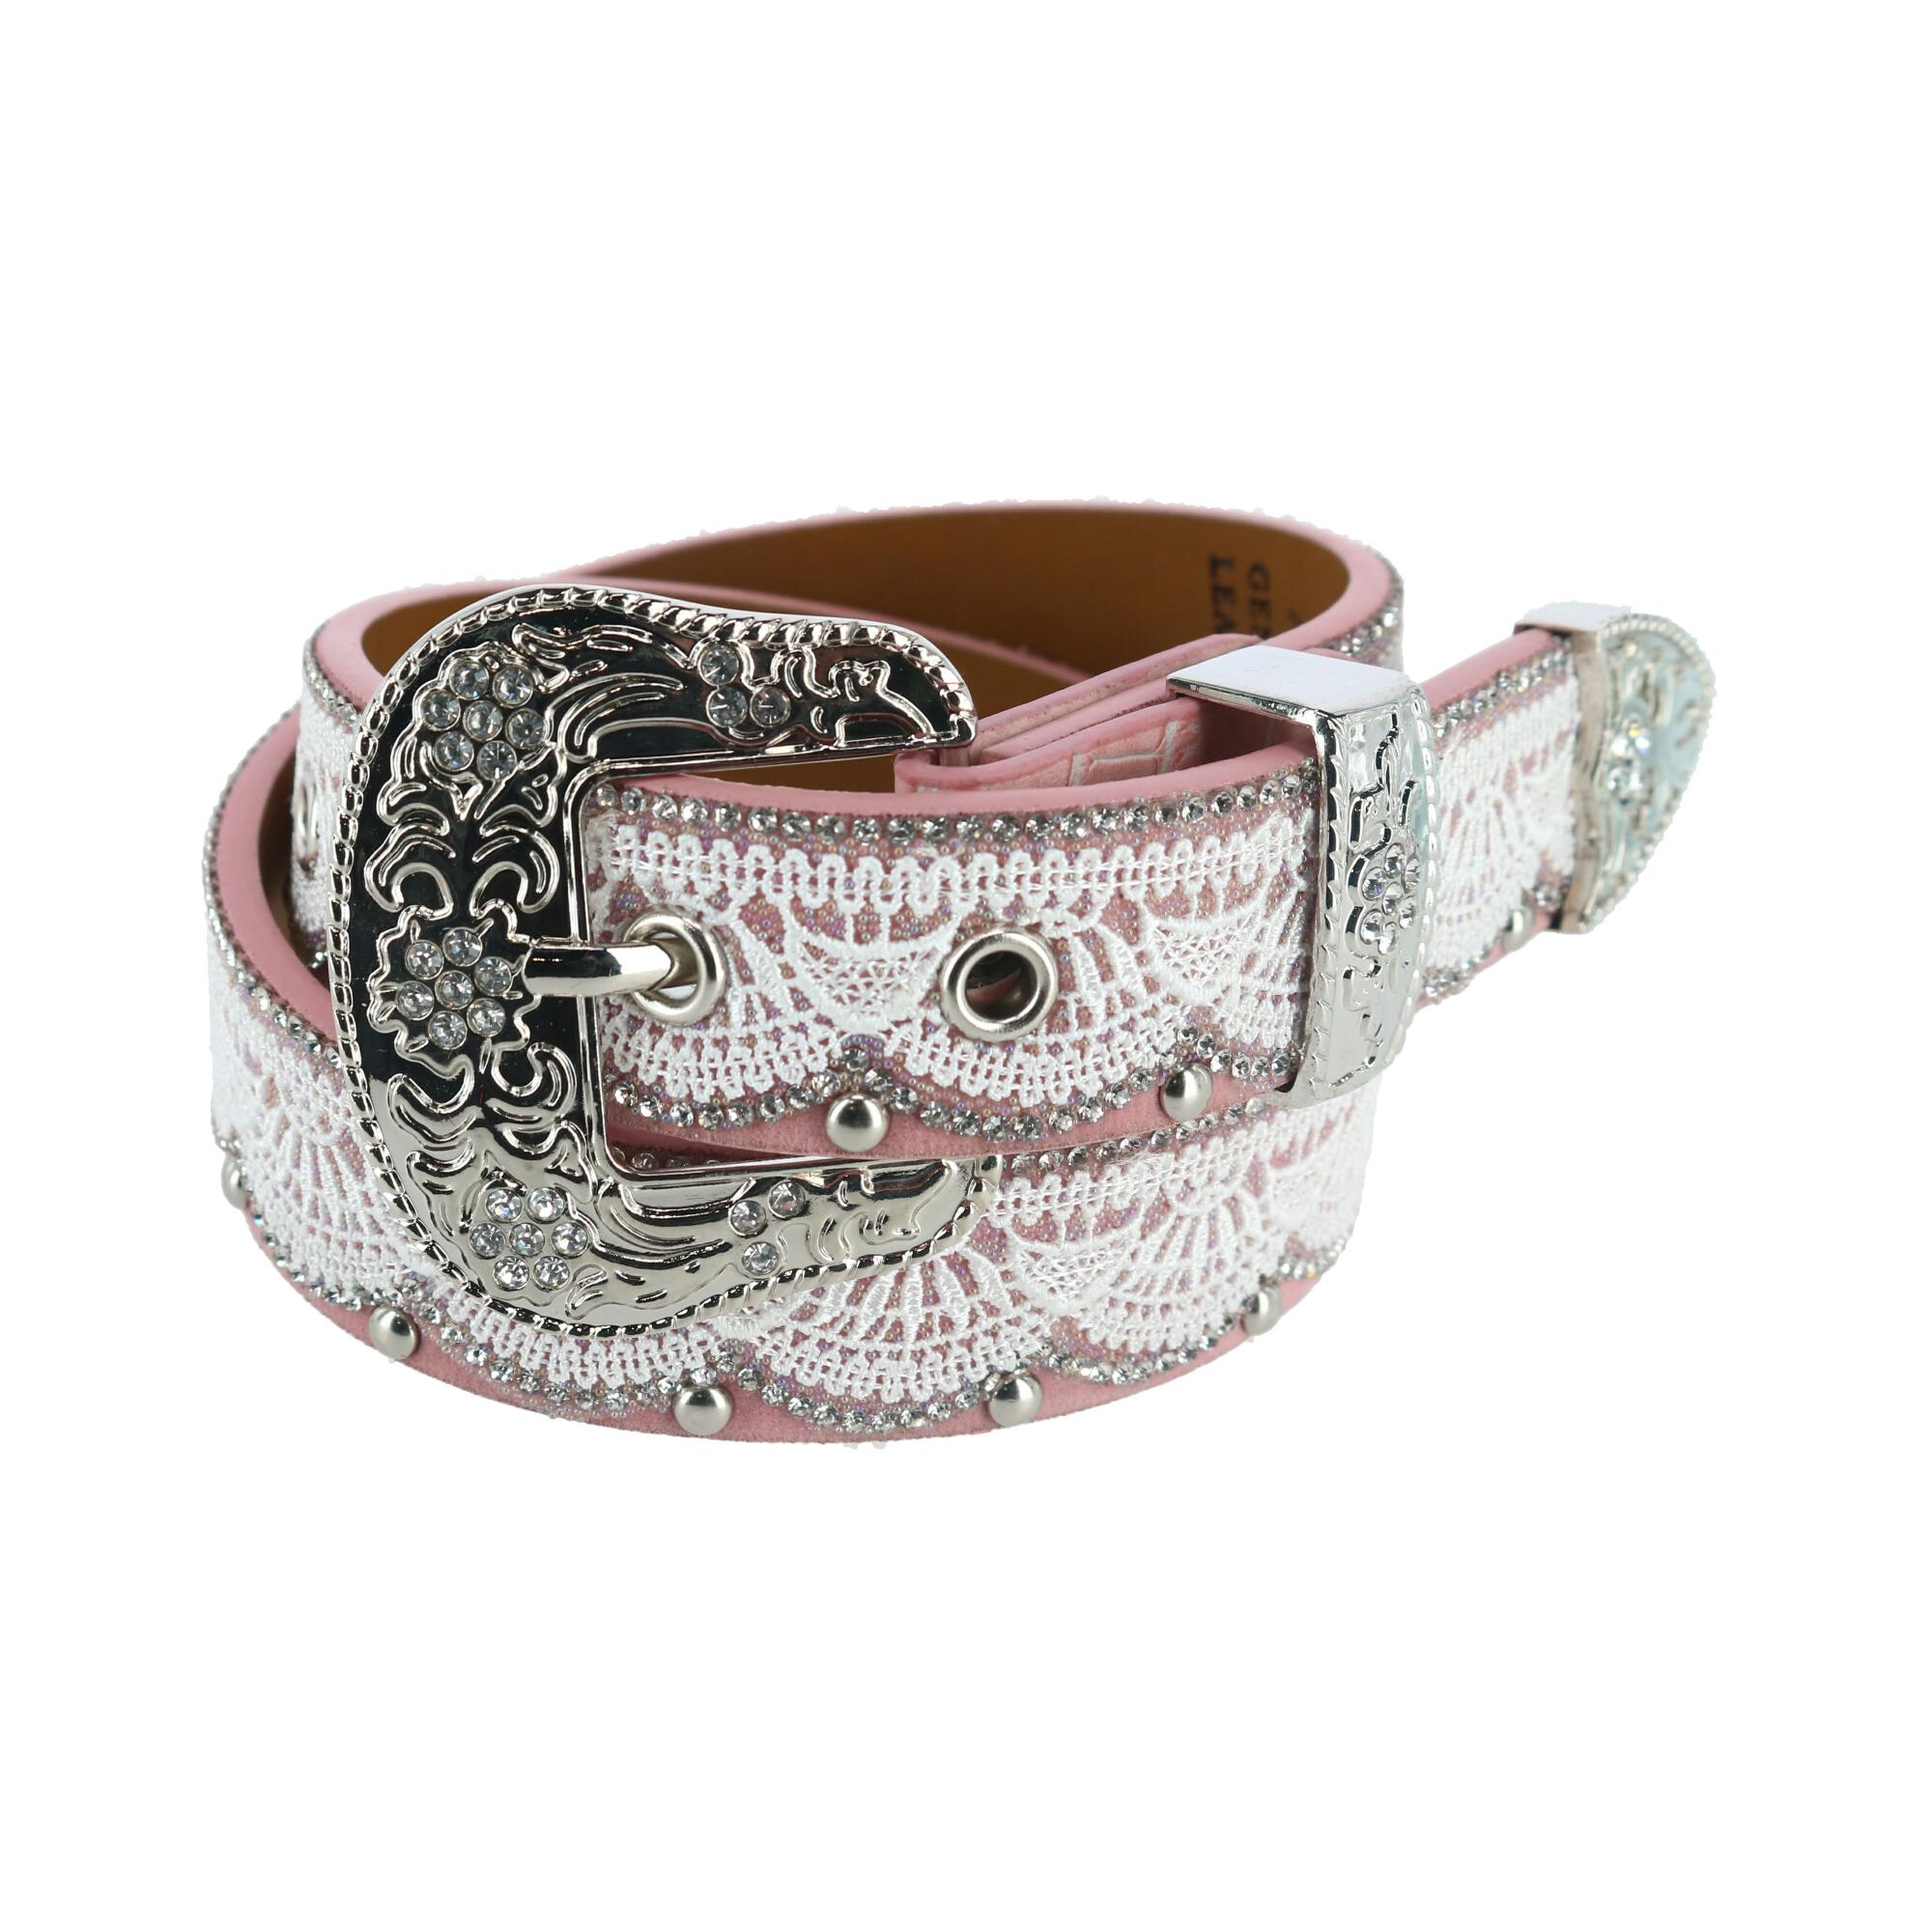 New 3 D Belt Company Girl's Lace Look Belt